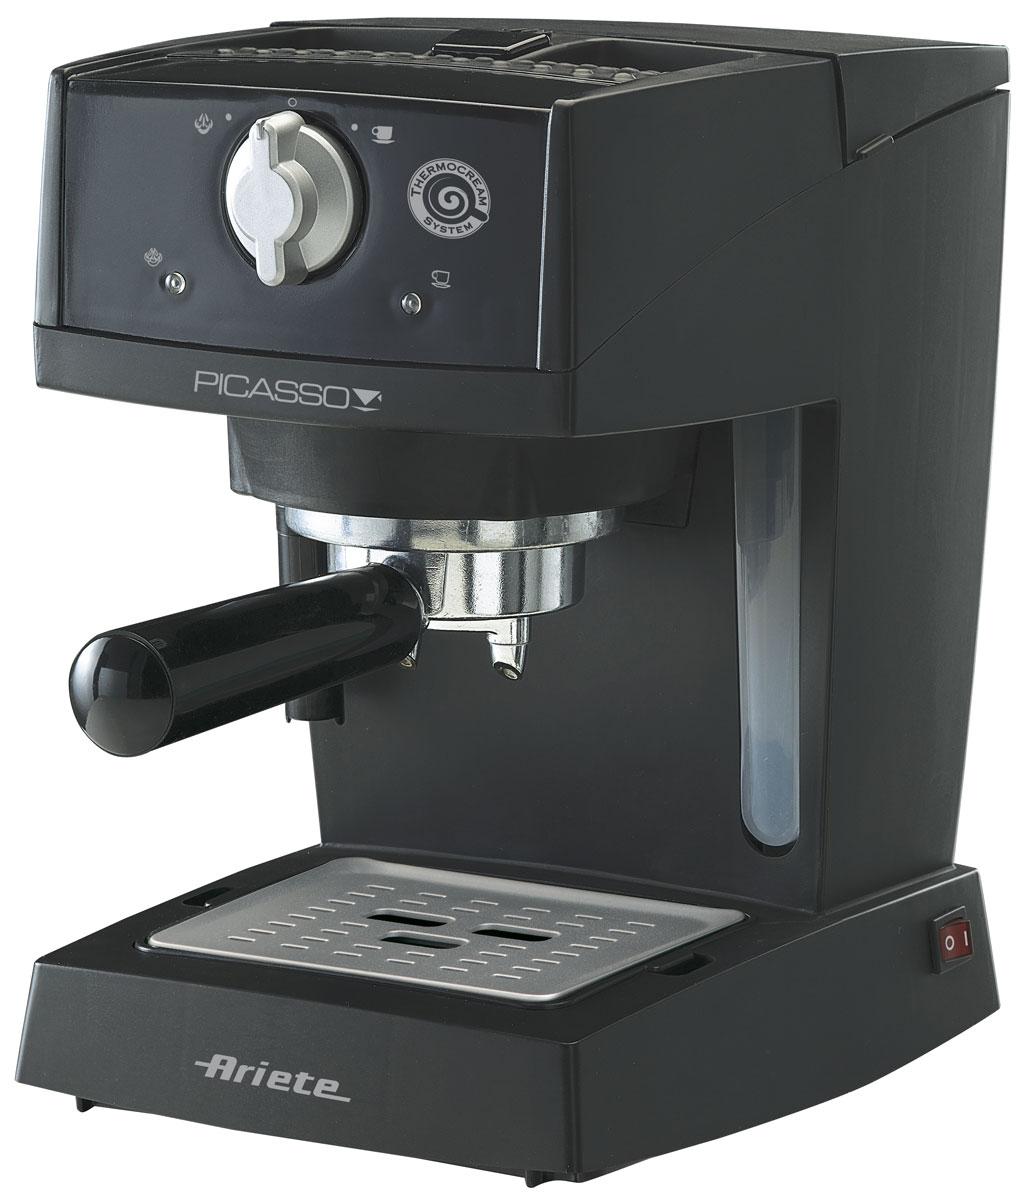 Ariete 1365 Picasso, Black кофеварка эспрессо